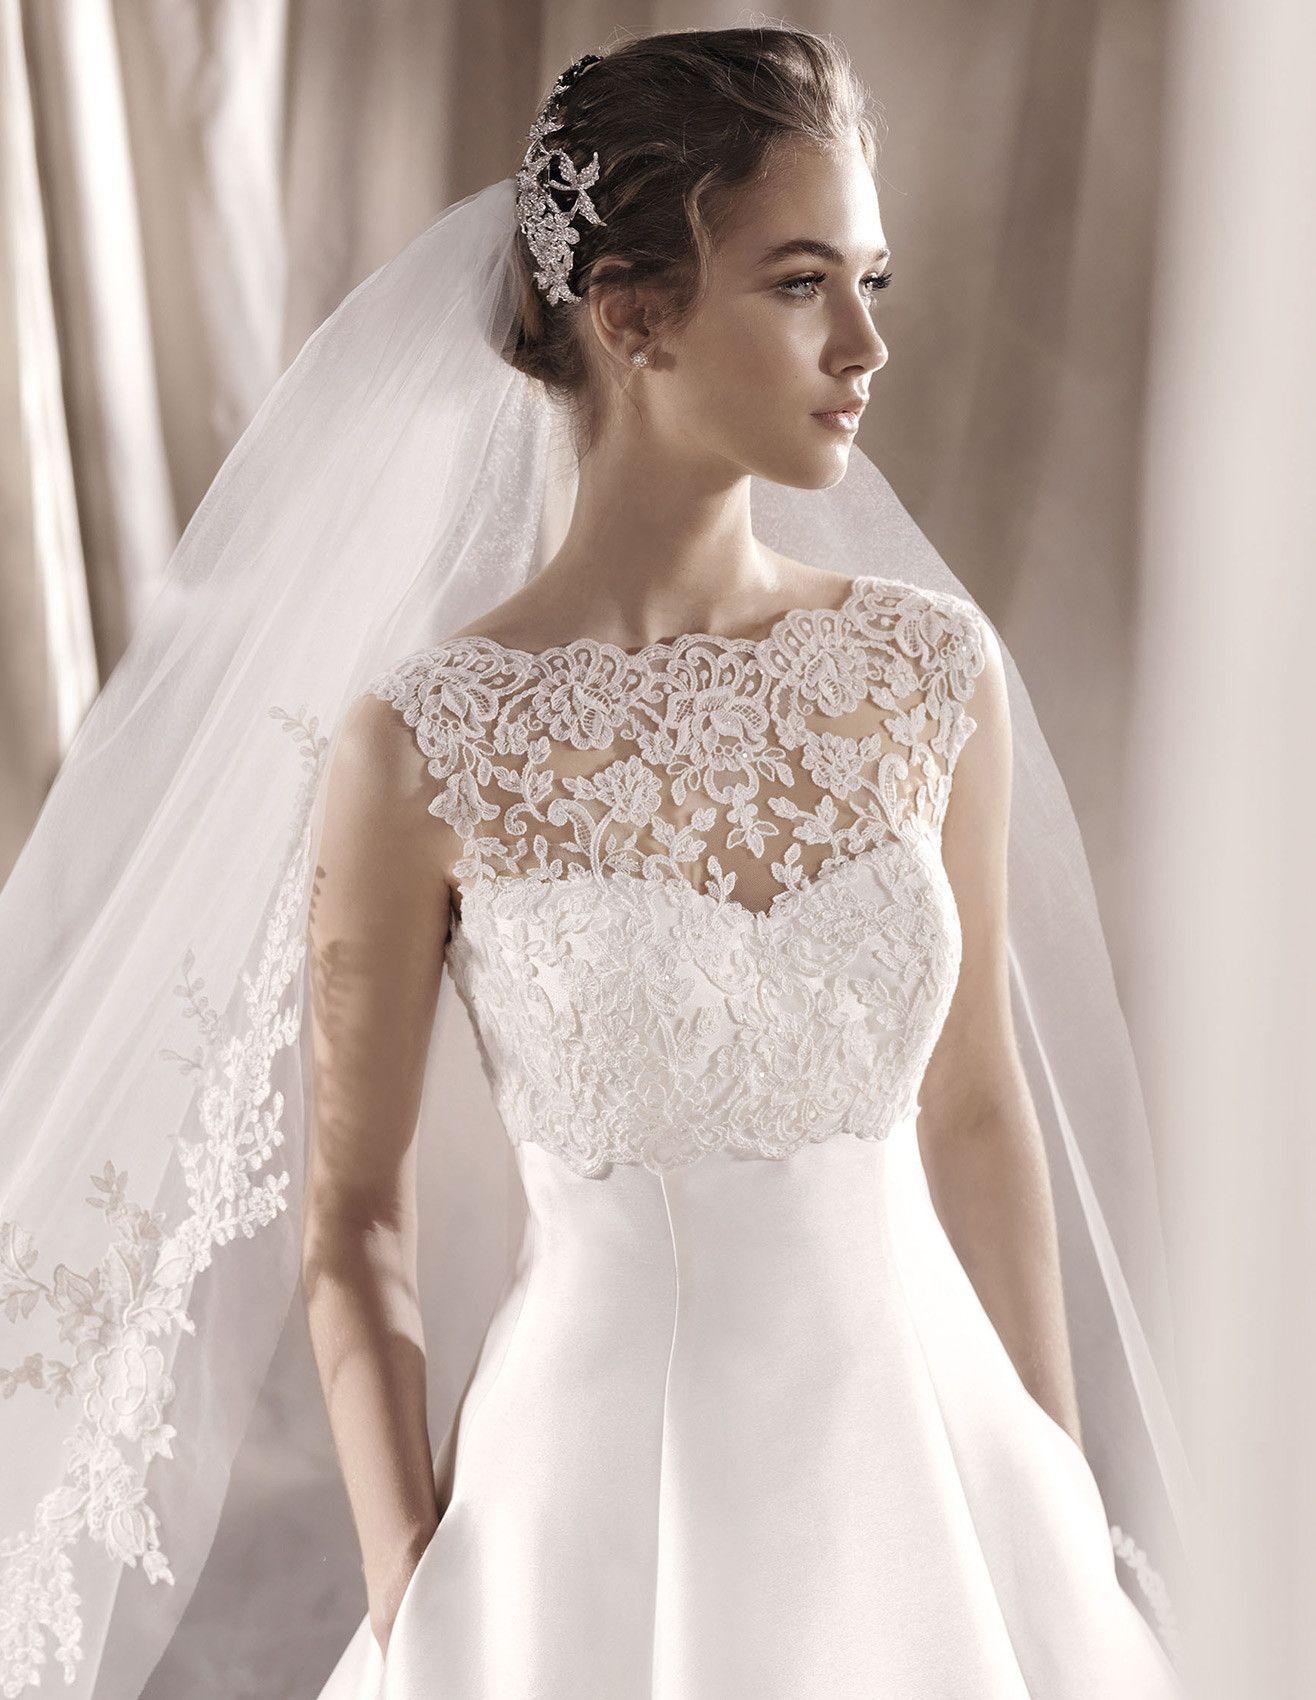 wedding dress sabia   Fátyol/Veil   Pinterest   Wedding dress ...